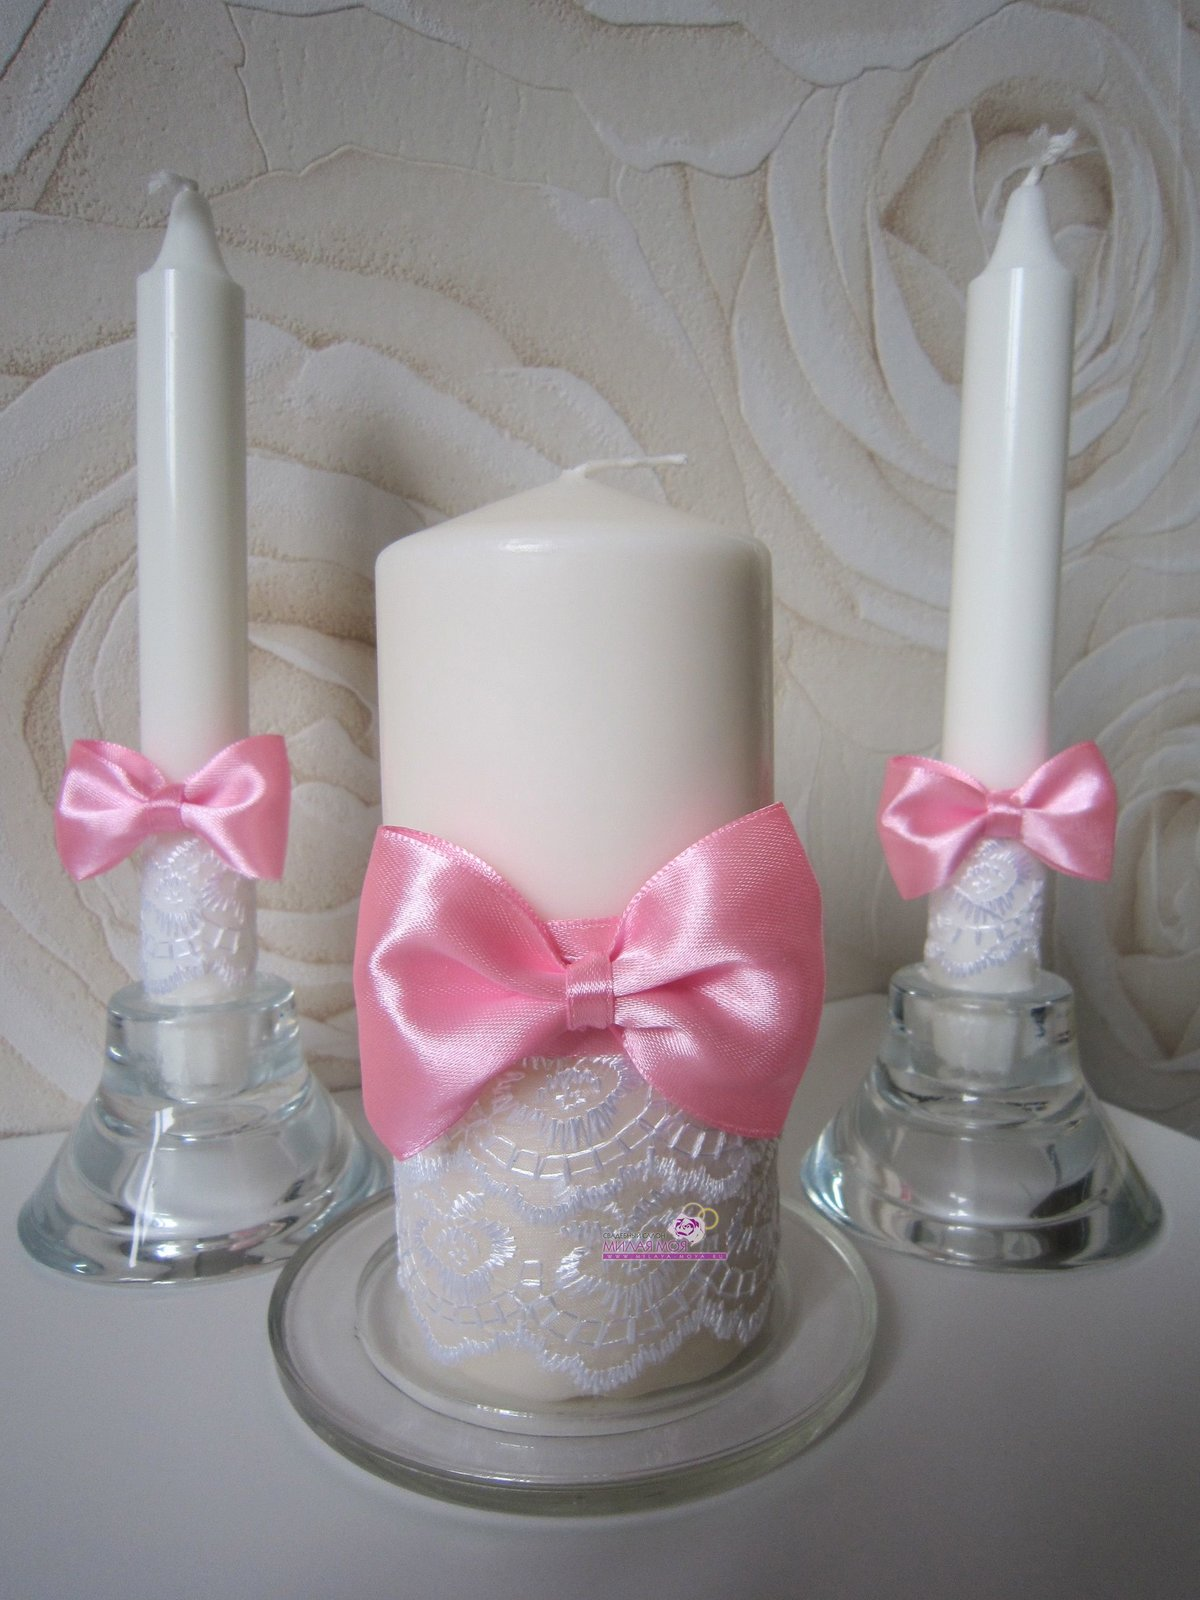 Банты на свечи своими руками